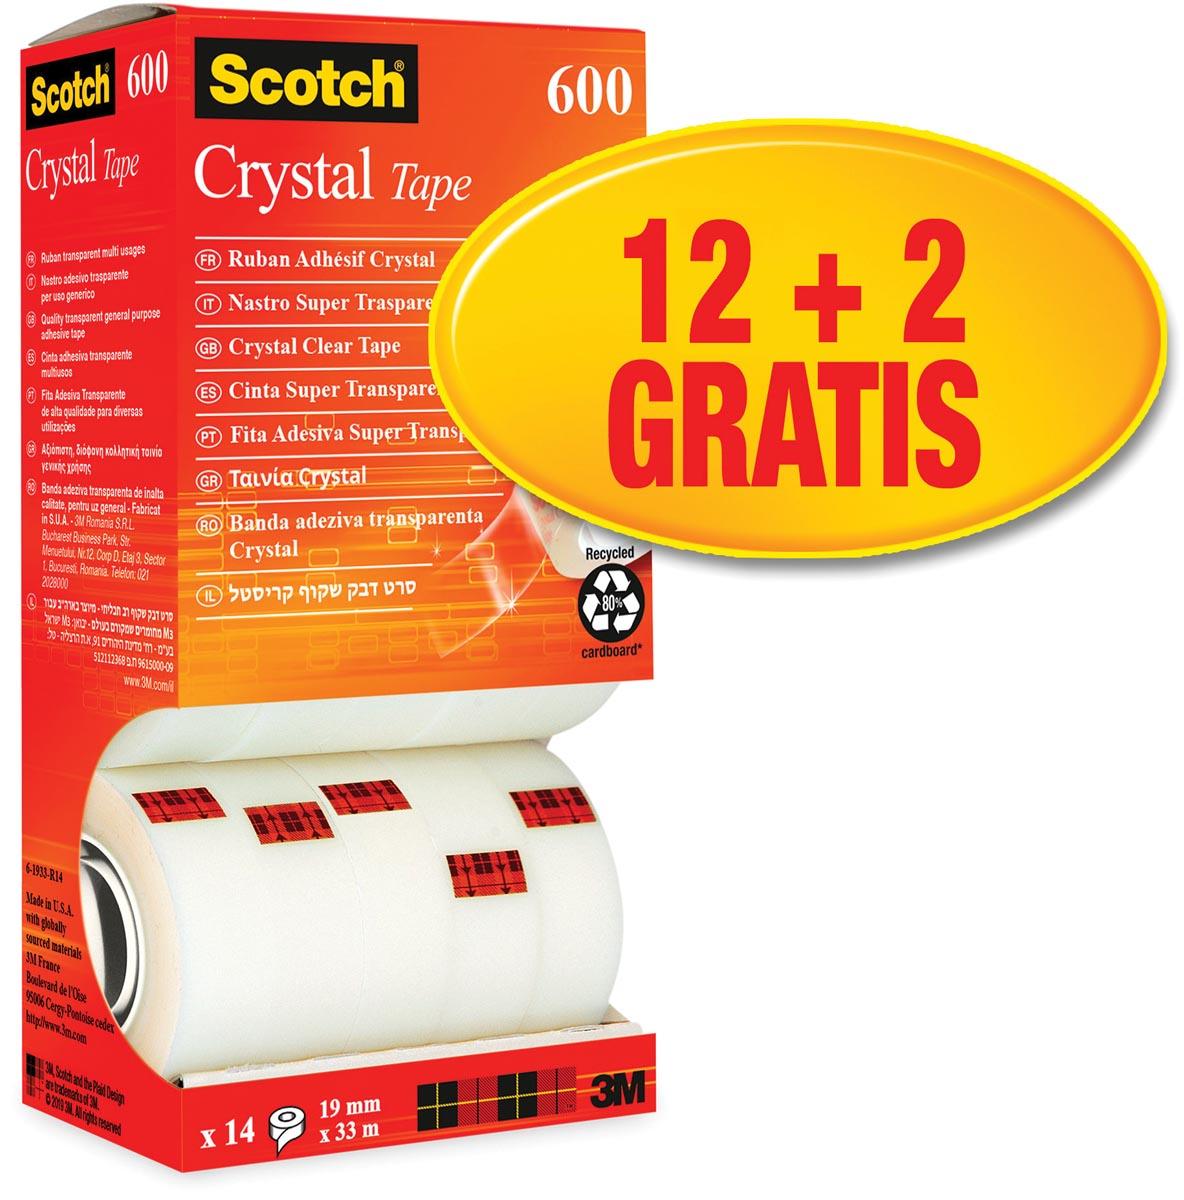 Scotch Plakband Crystal ft 19 mm x 33 m, doos met 14 rolletjes (12 + 2 gratis)